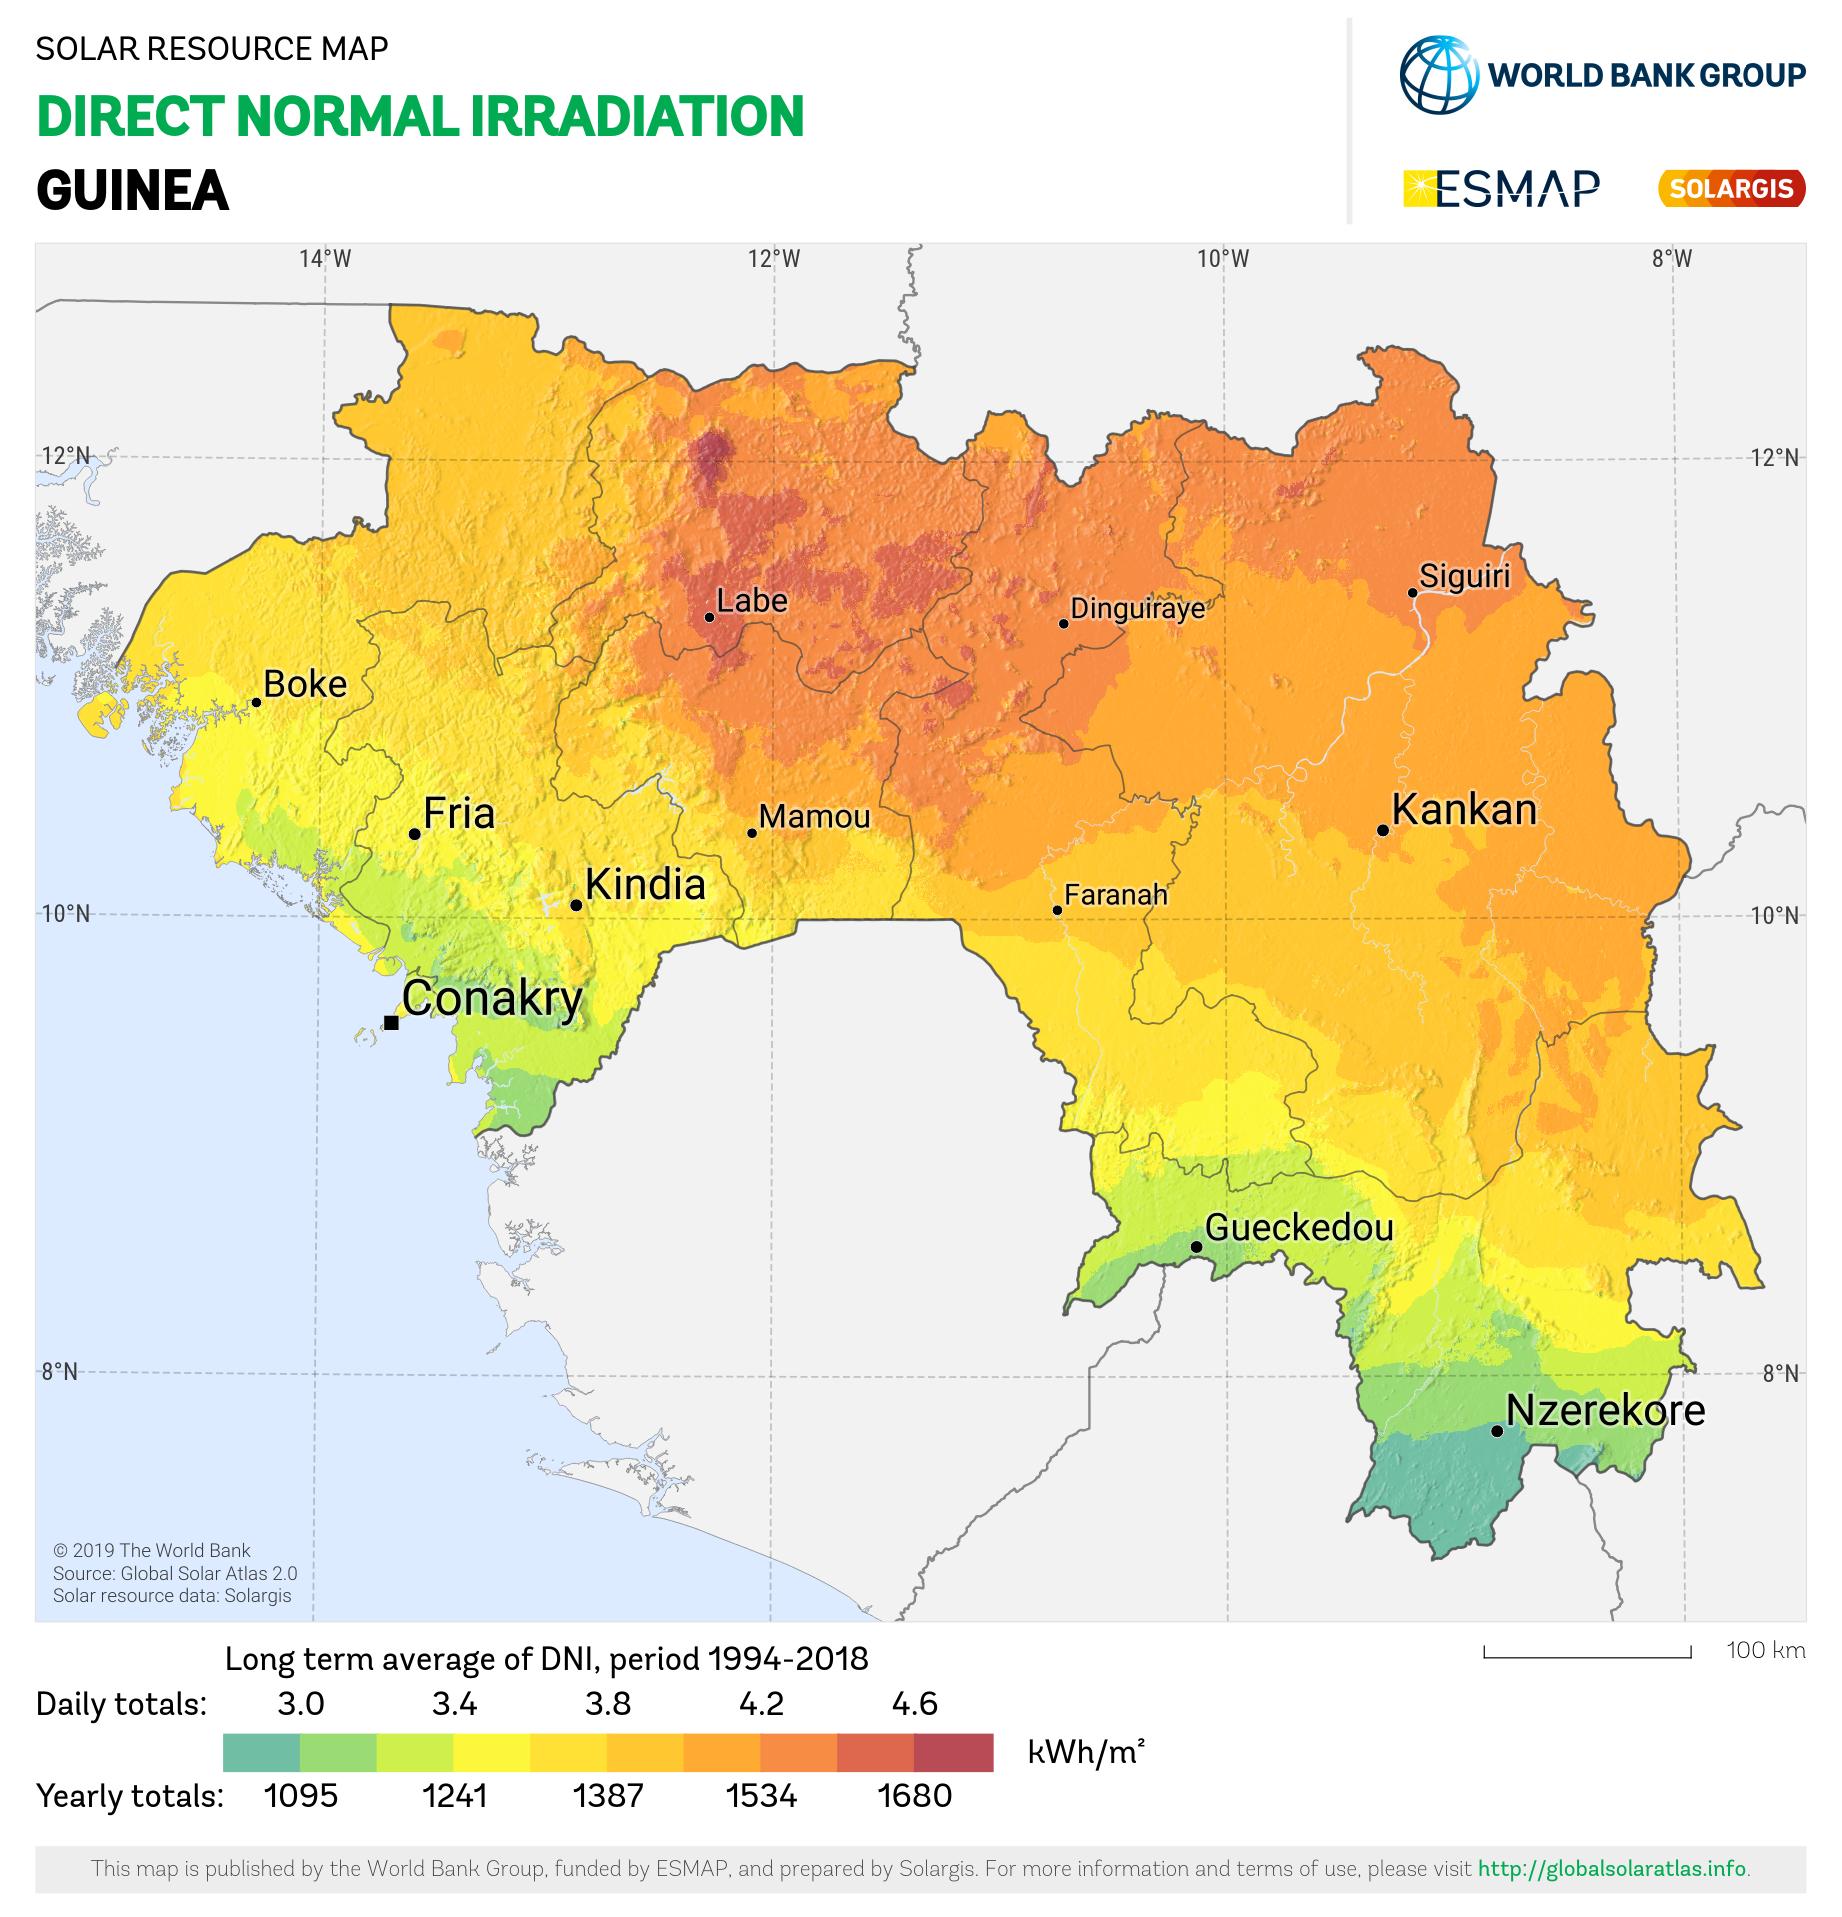 SOLARGIS_DNI Guinea_PVOUT KWH per m2